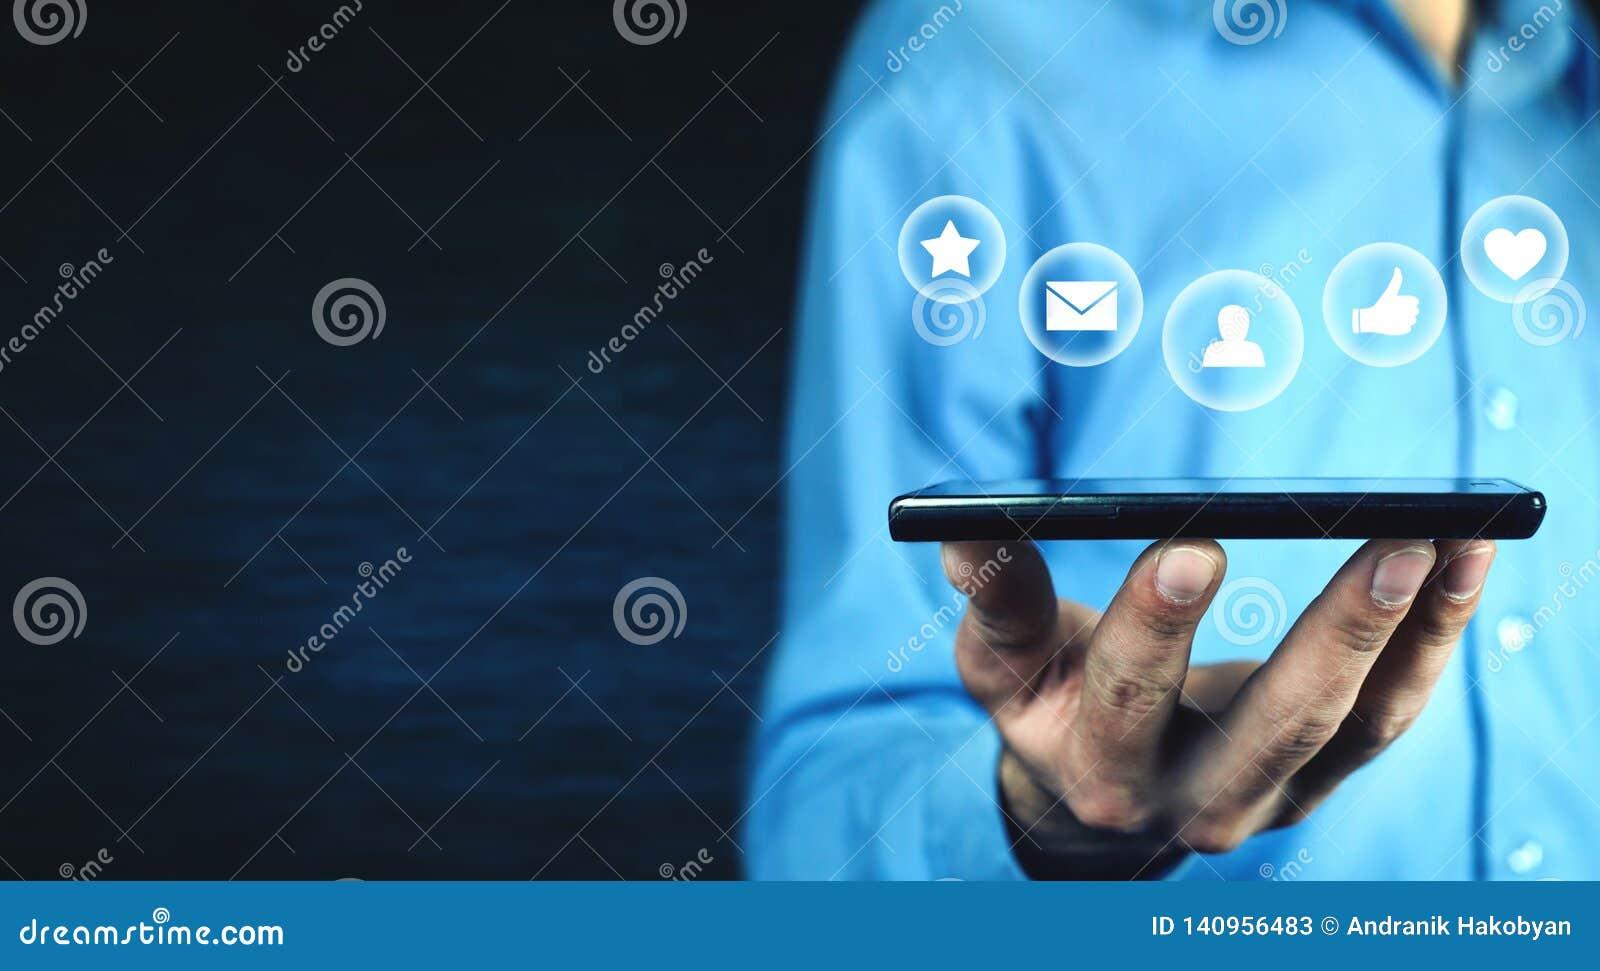 De telefoon van de mensenholding Sociaal media concept